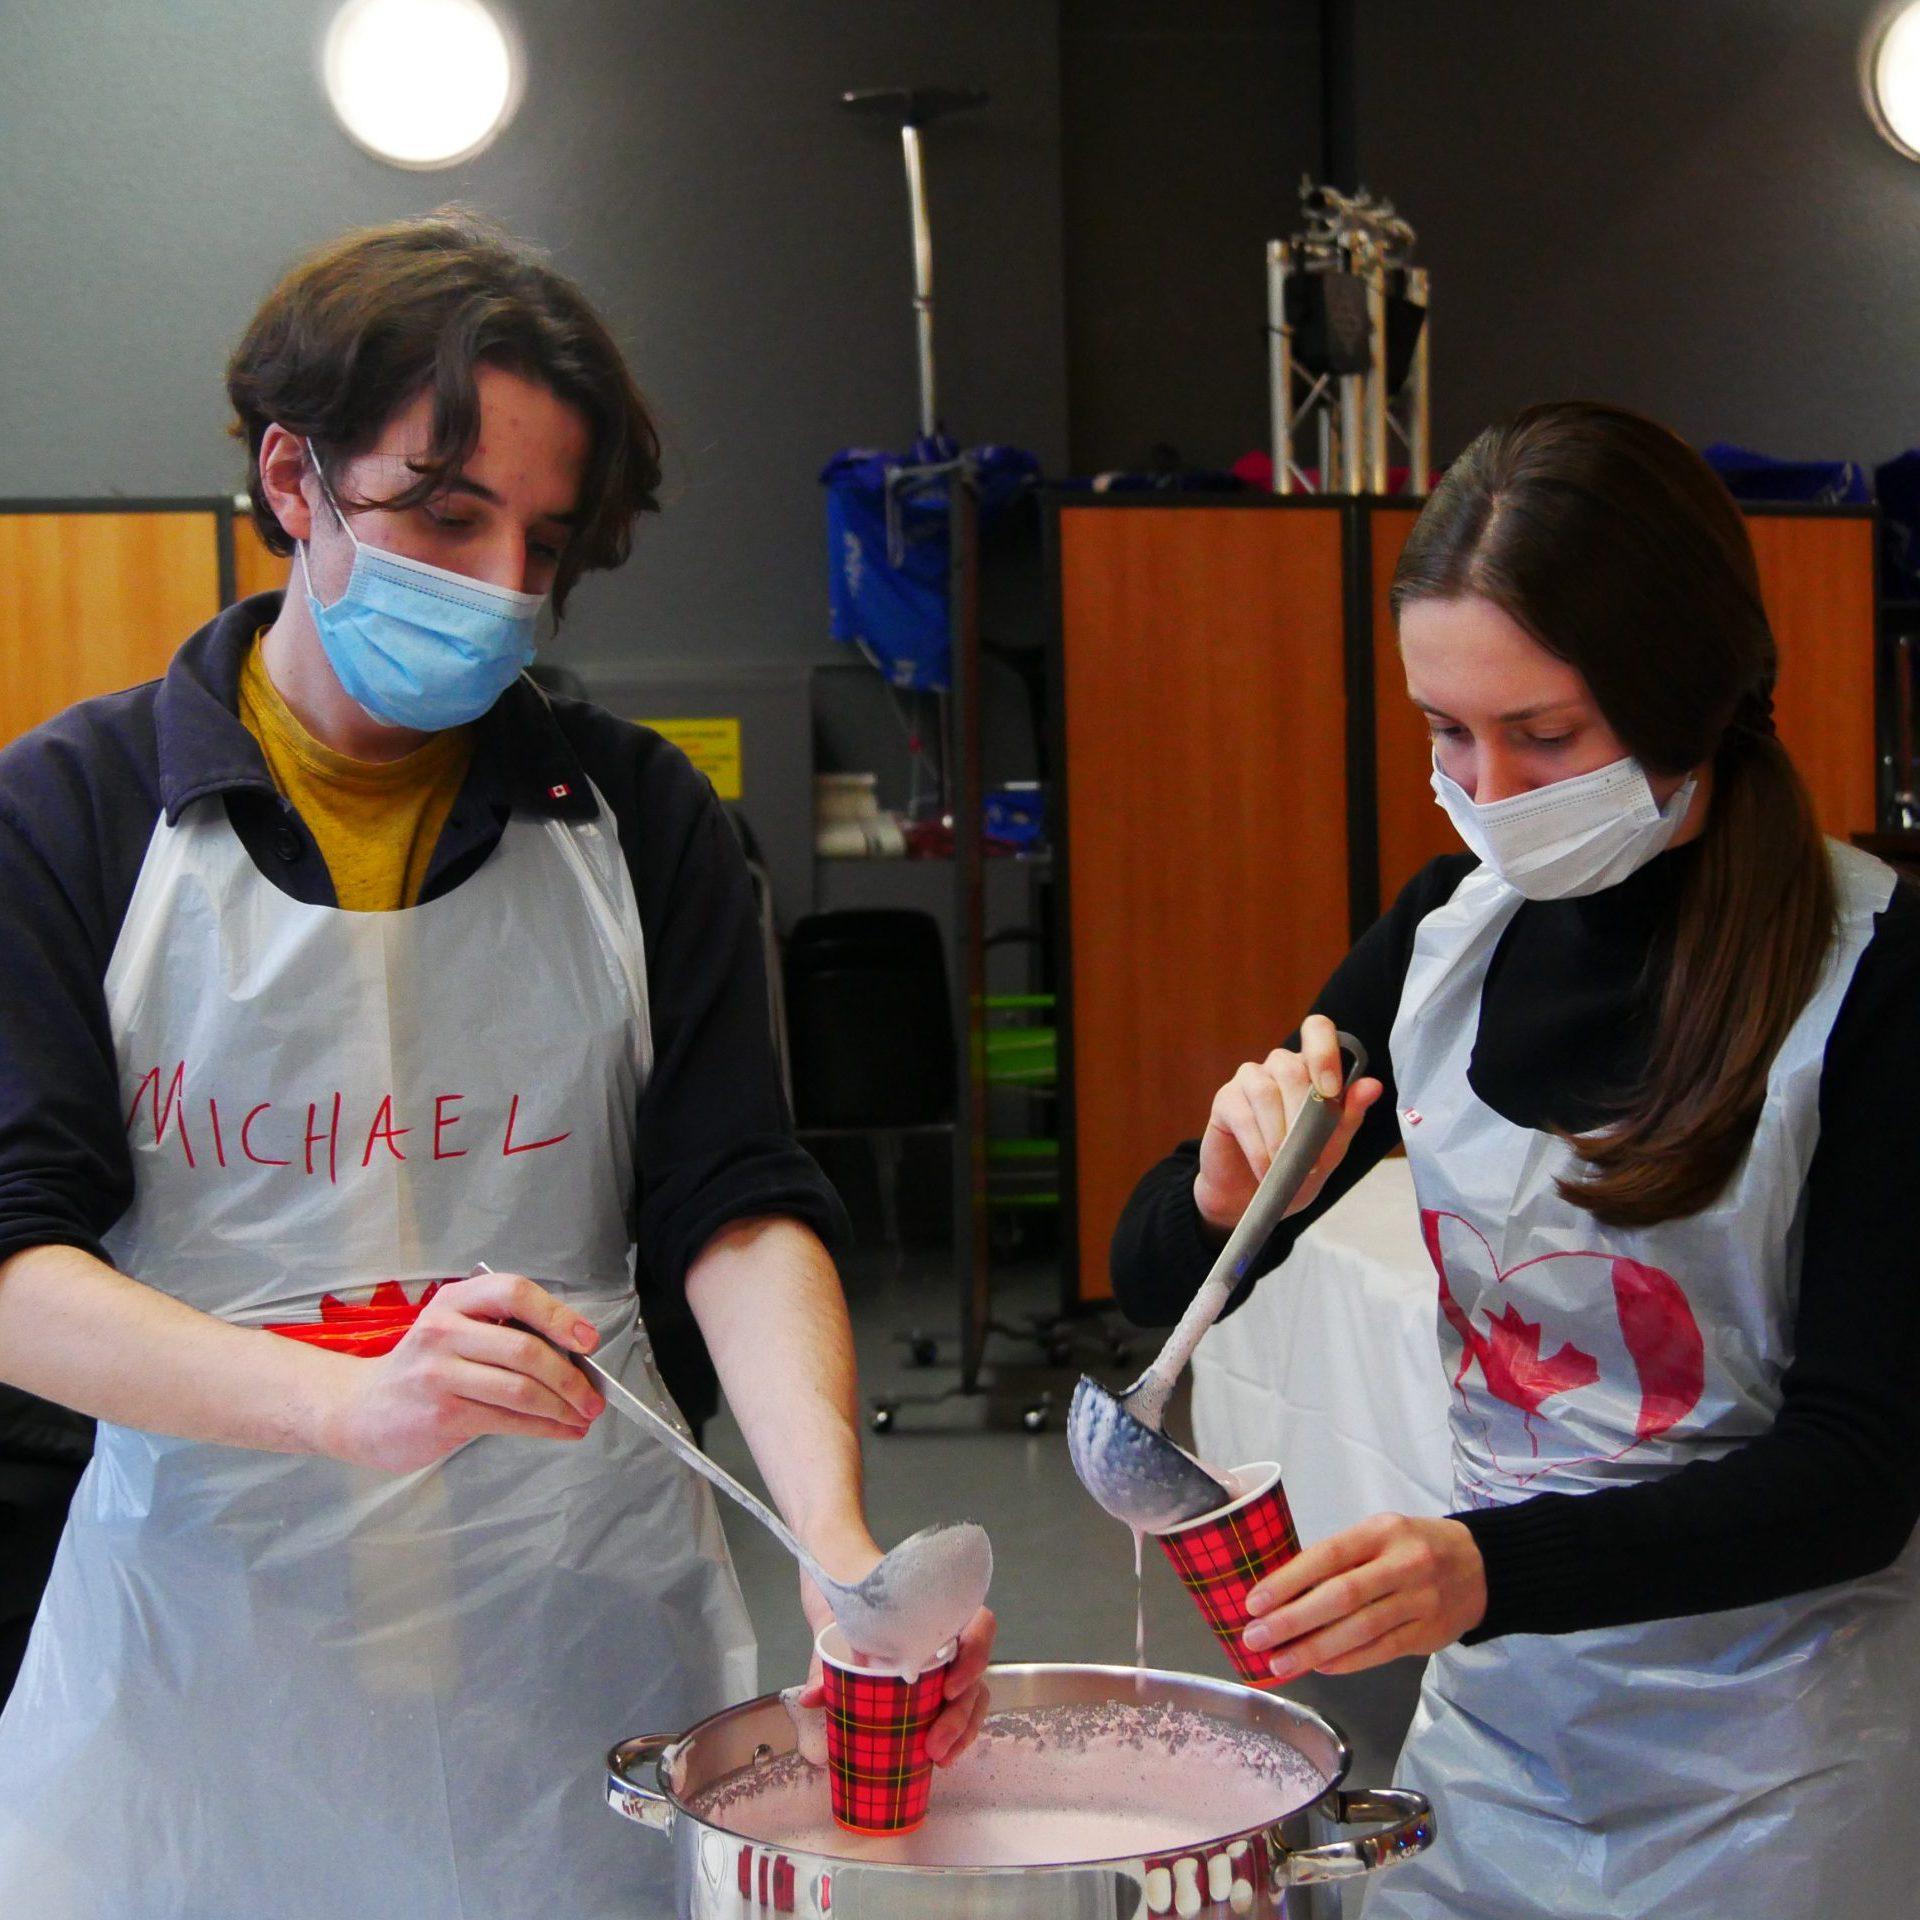 équipe en cuisine